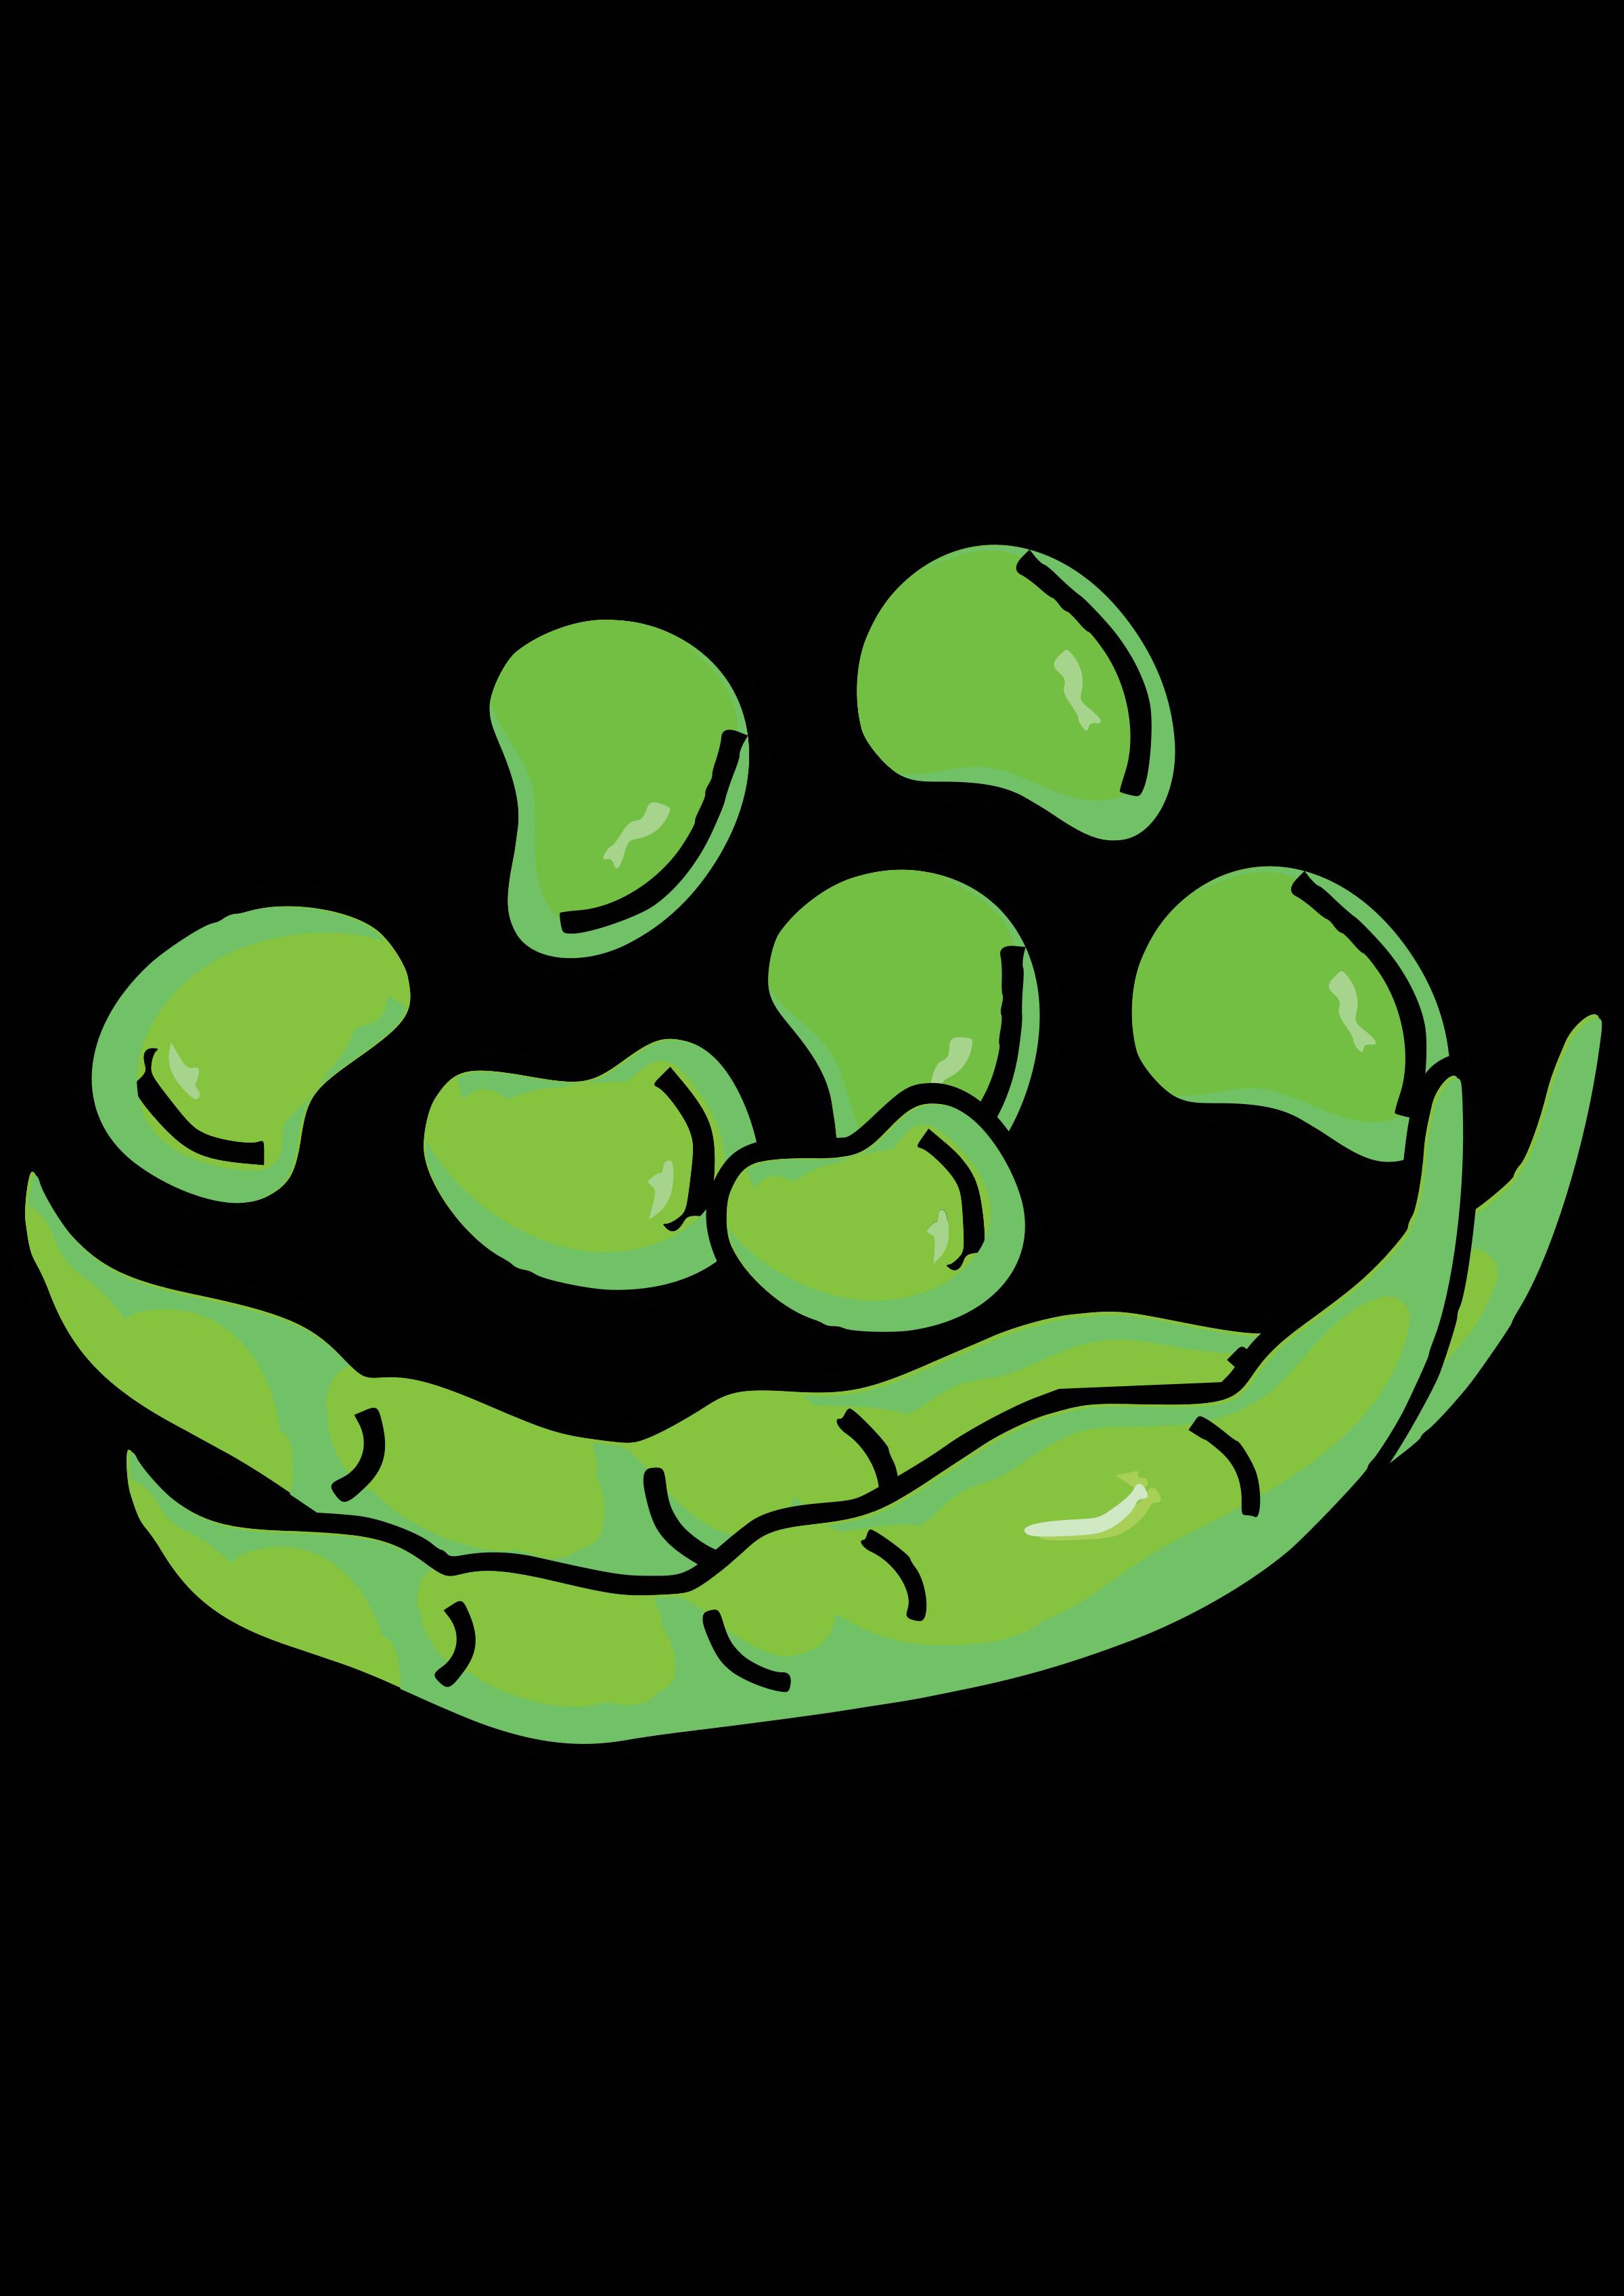 Bean clipart broad bean, Bean broad bean Transparent FREE.